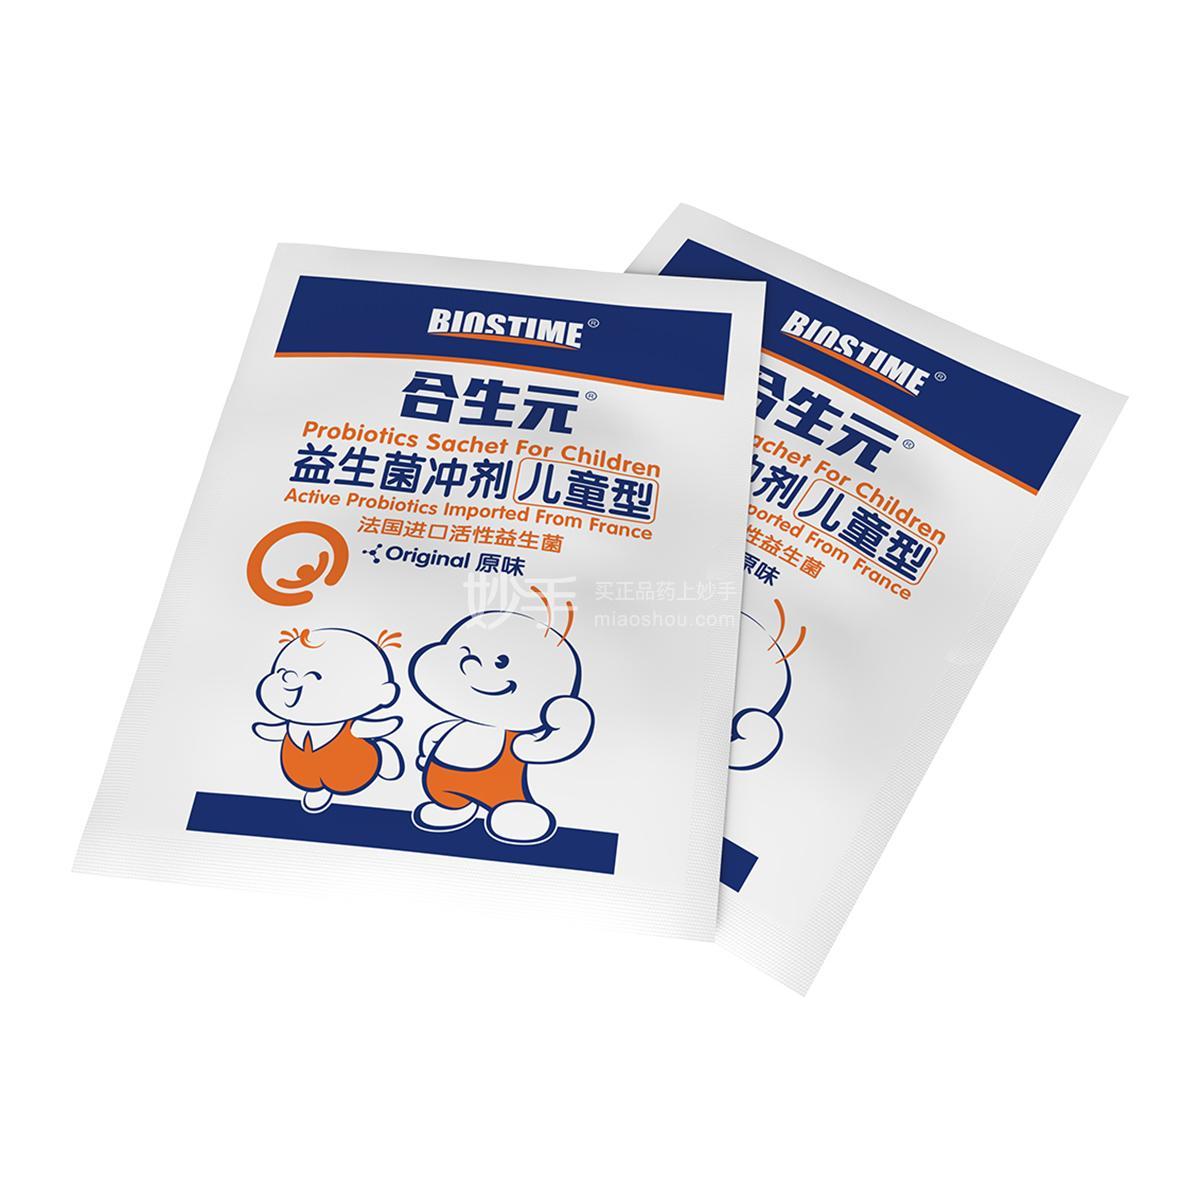 BIOSTIME/合生元 益生菌冲剂(儿童型) 1.5g*26袋